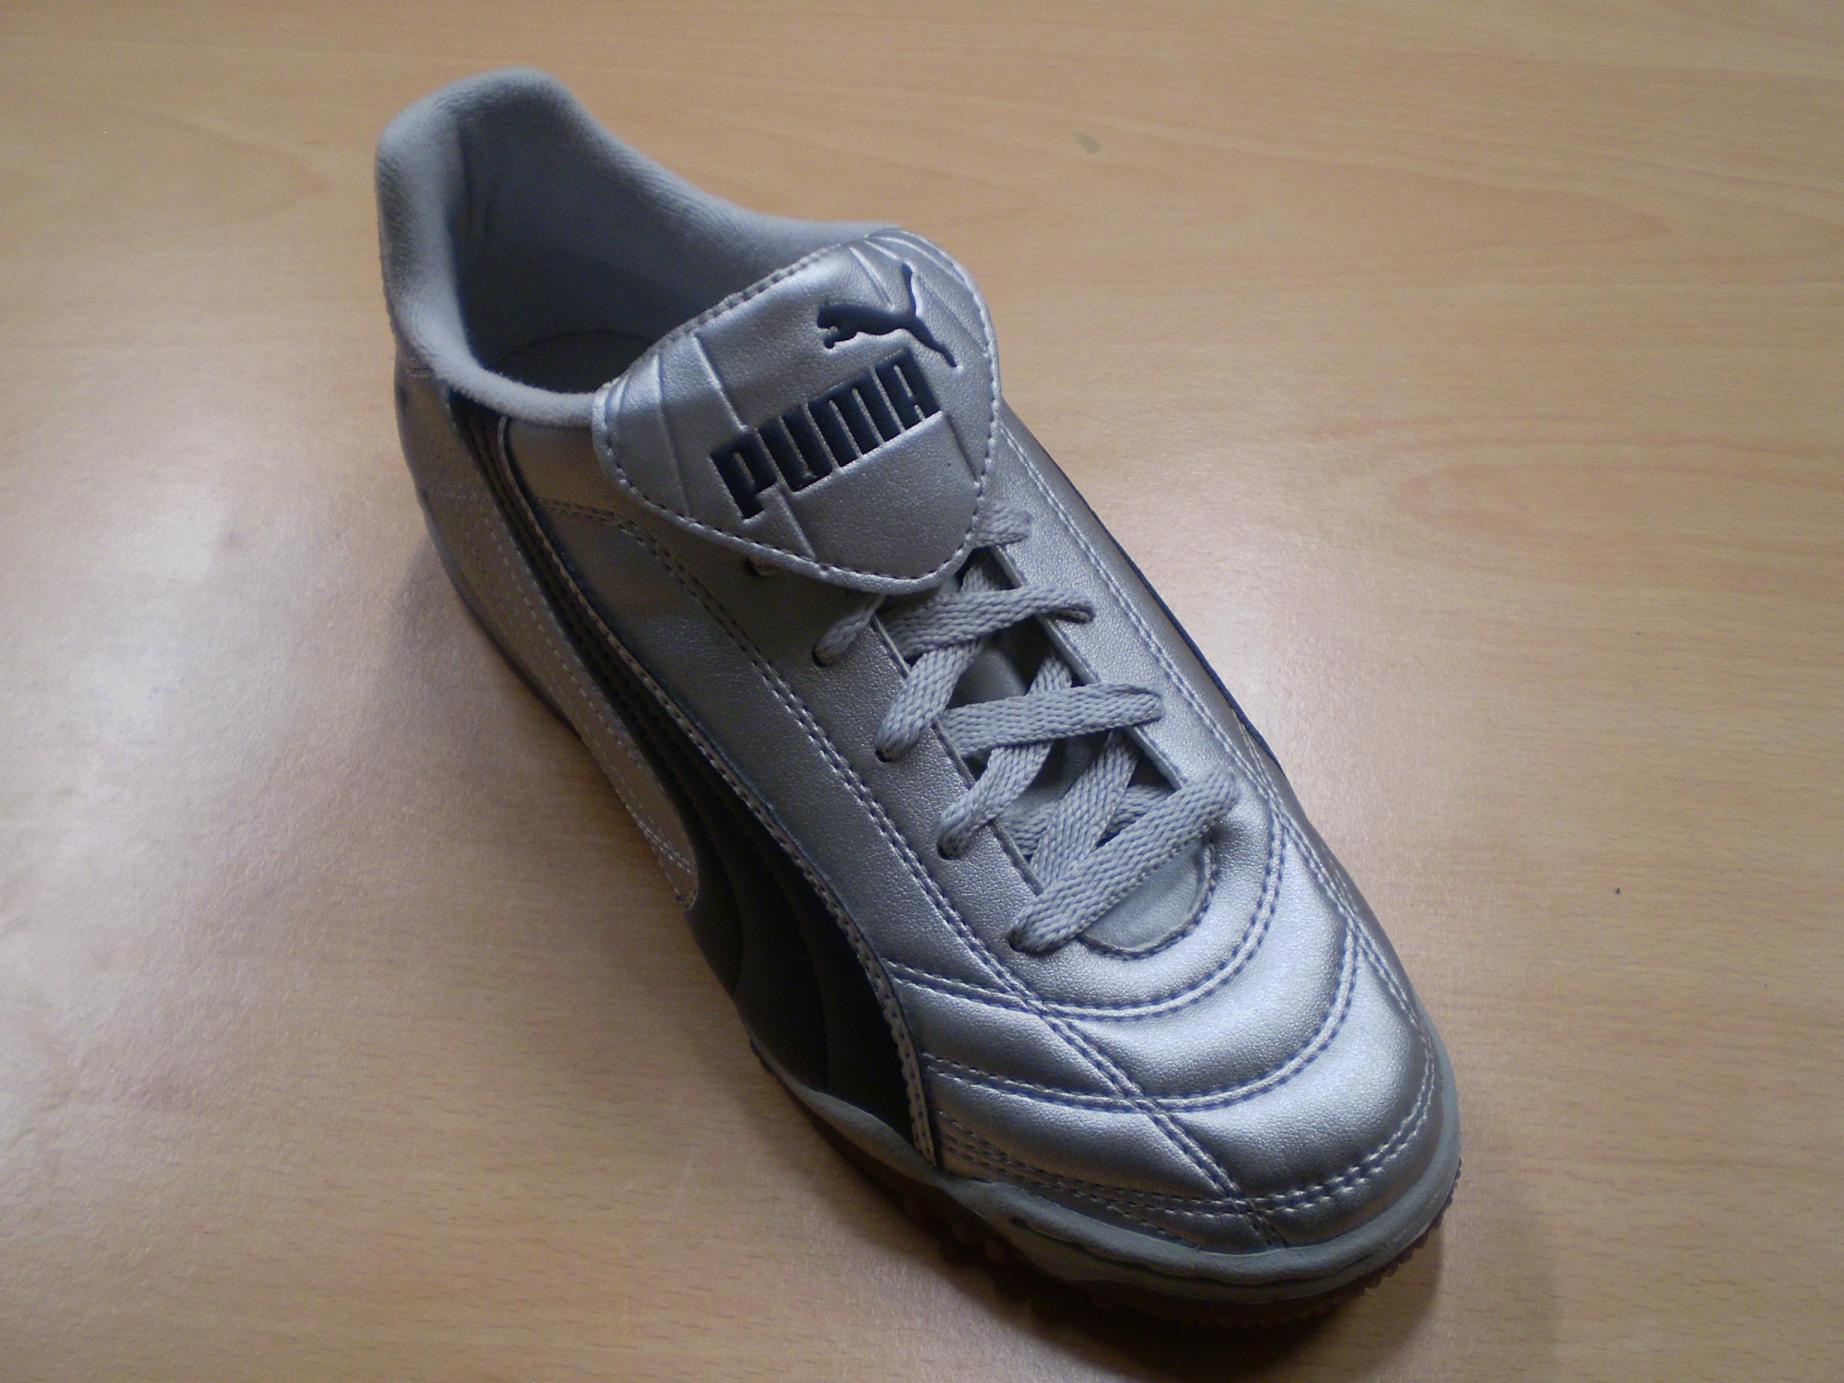 sálová obuv Puma Jr - prima-sport.cz 30093f66b9b